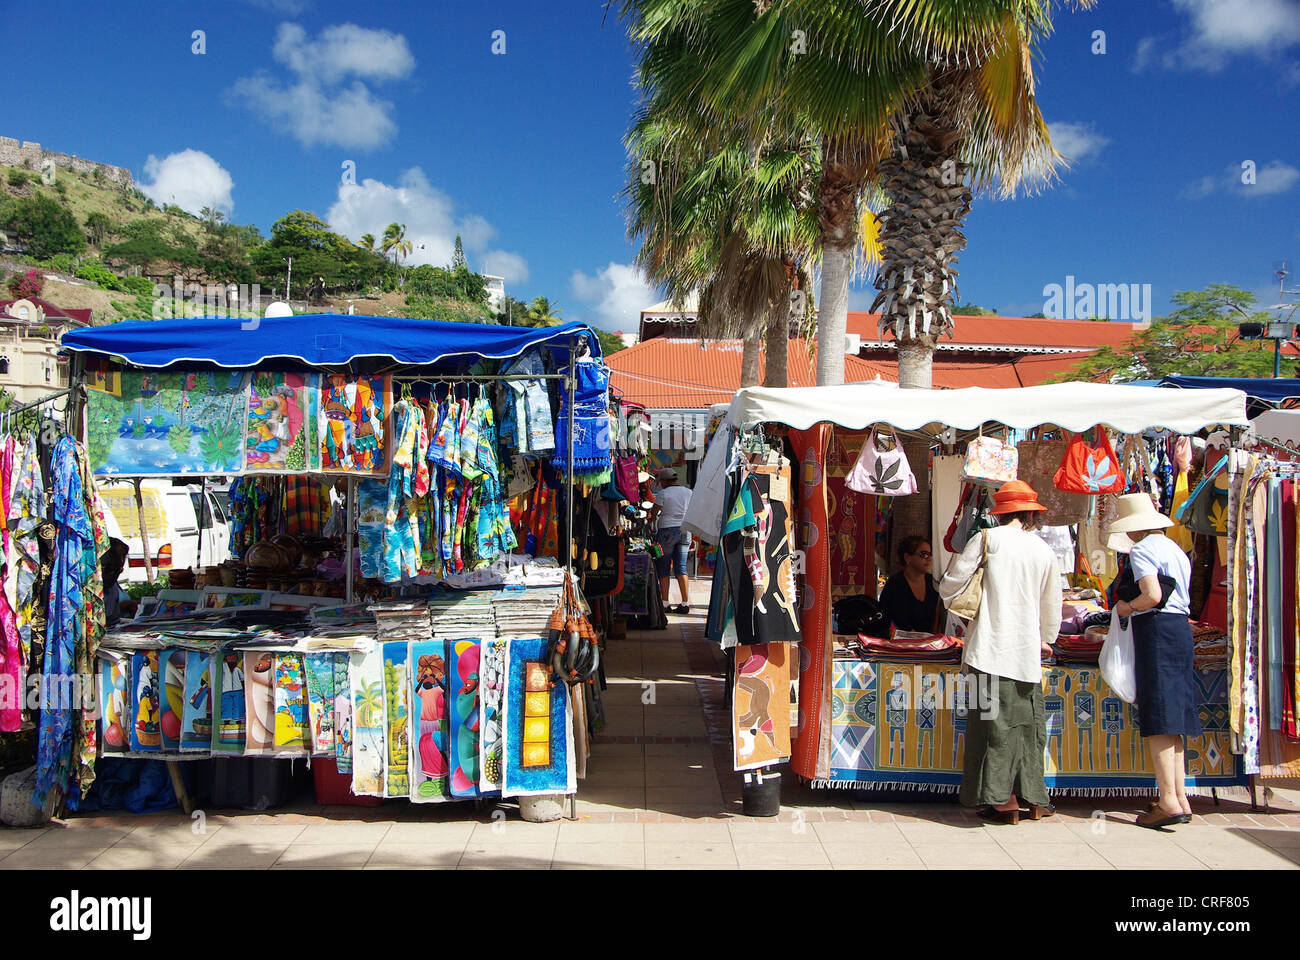 Marigot Freiluftmarkt, Franzoesische Antillen, Karibik, Saint-Martin Stockbild